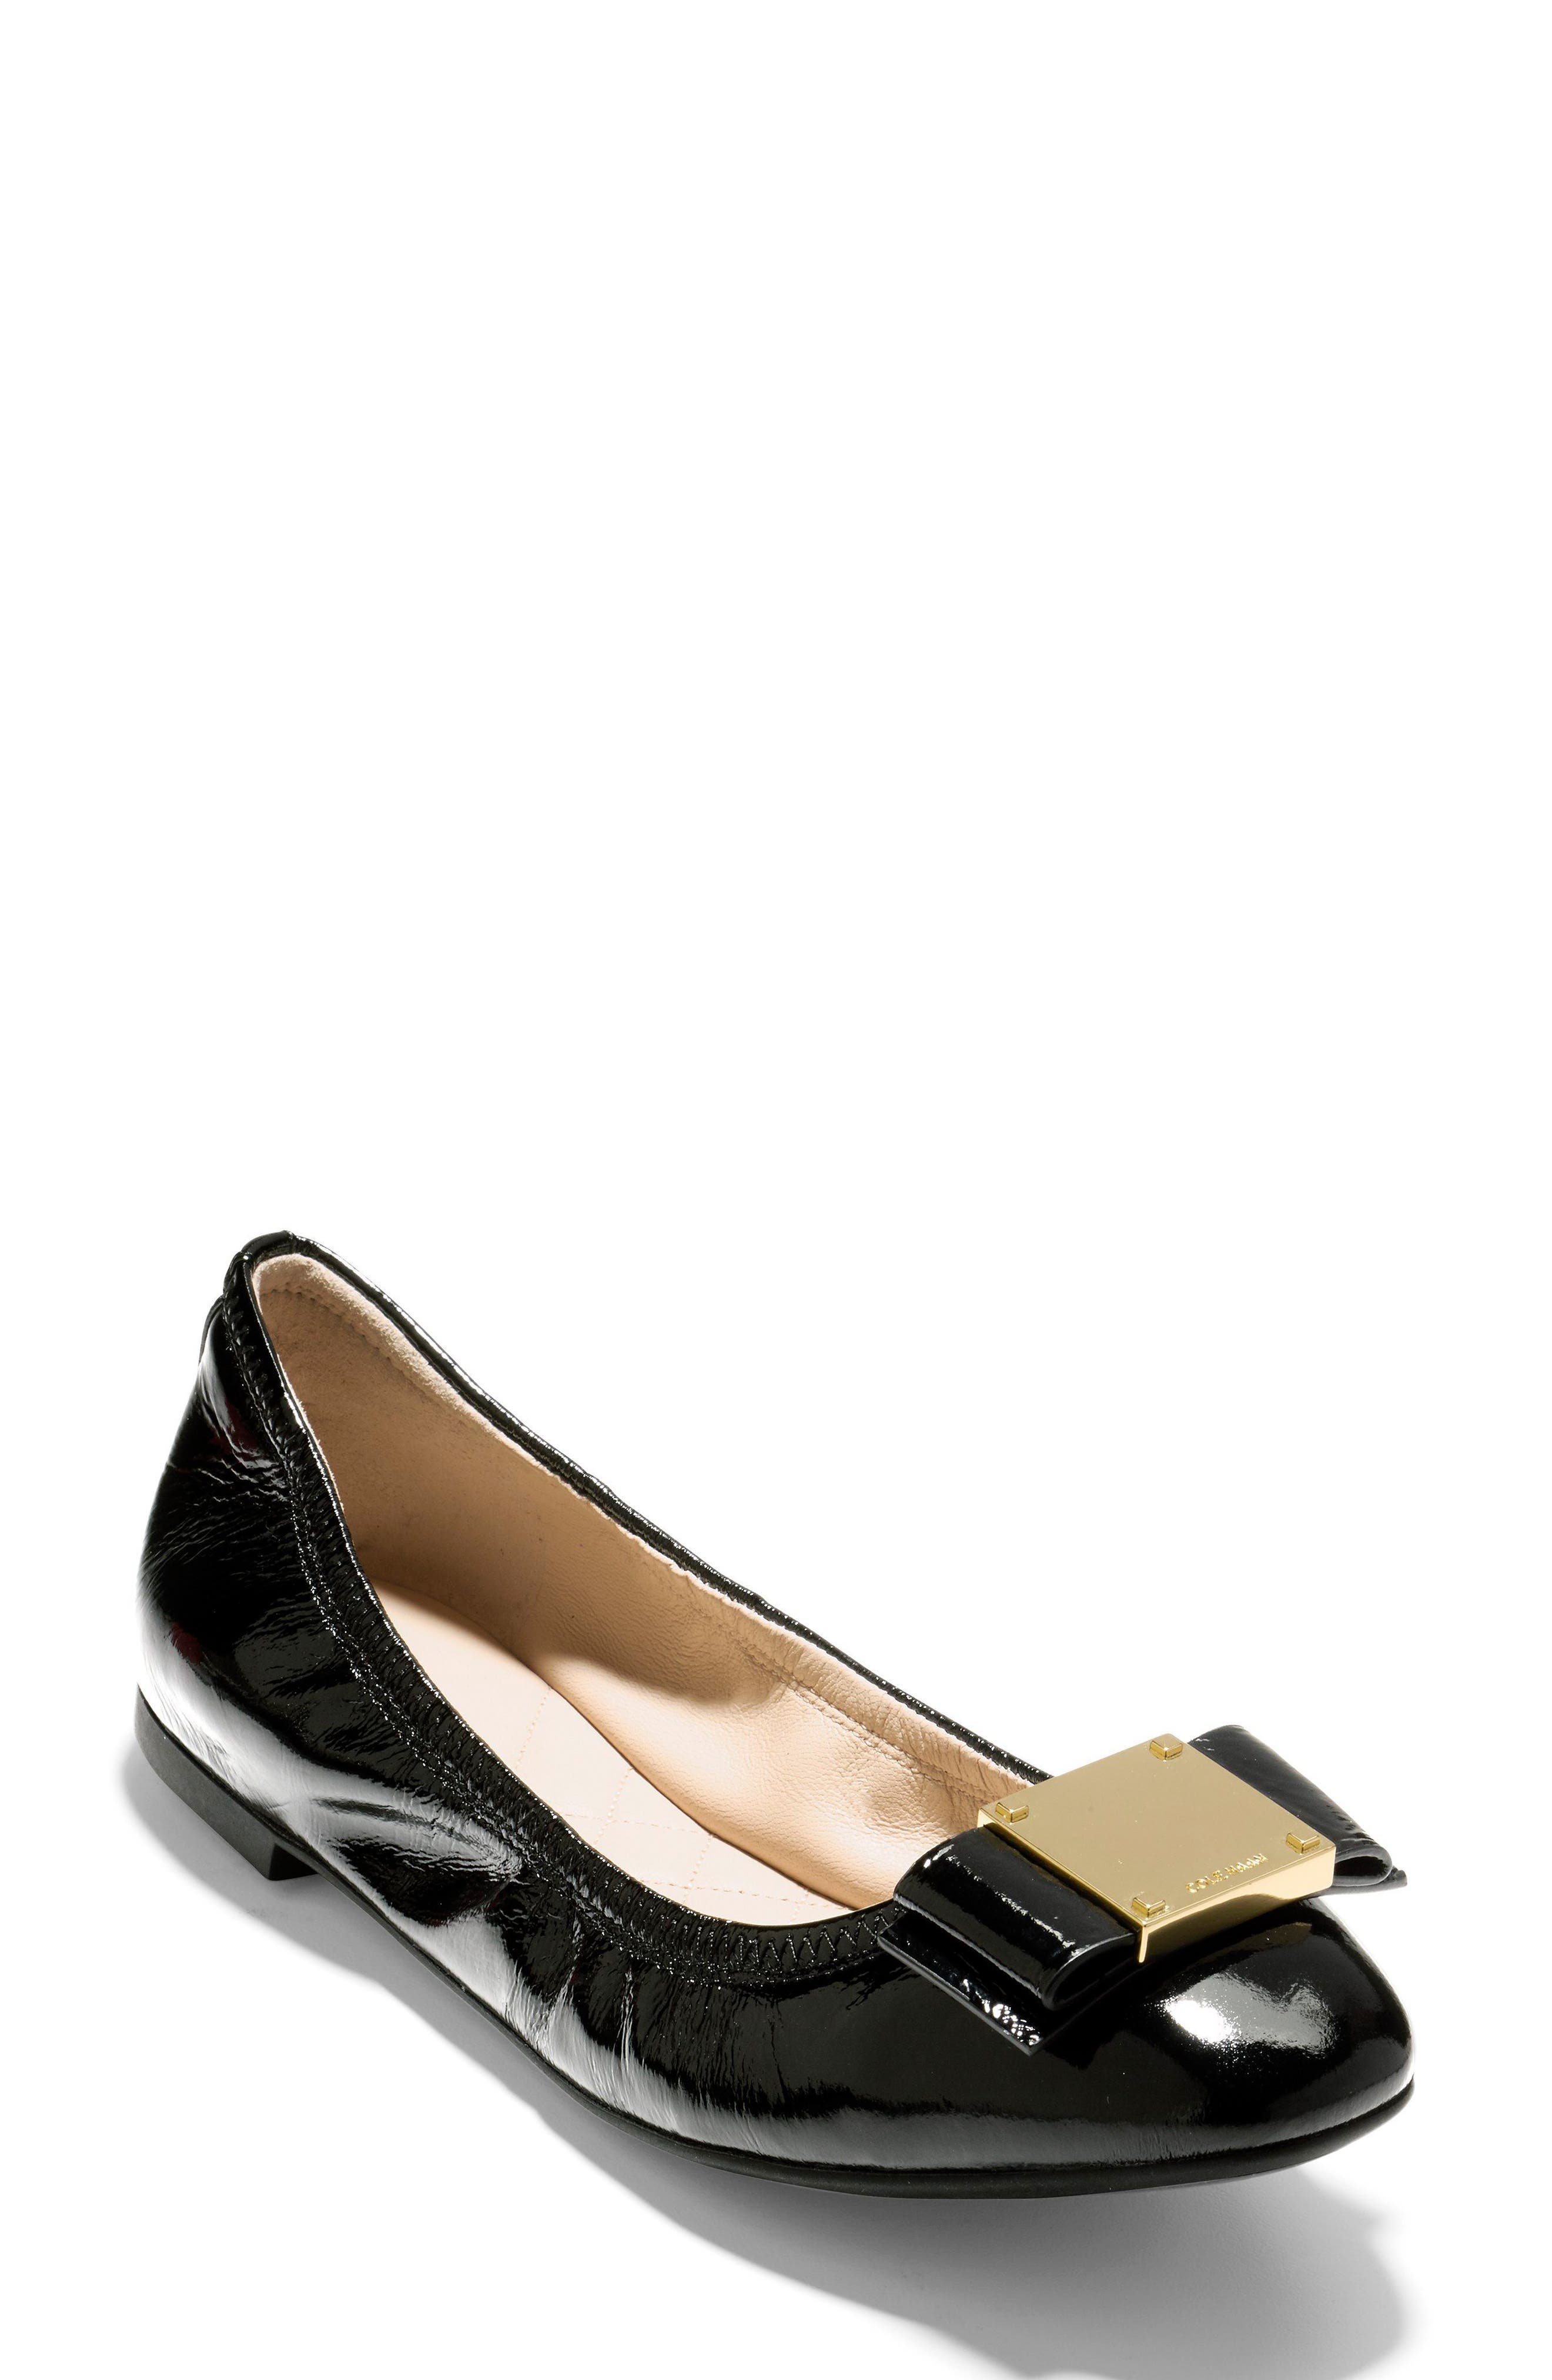 Tali Modern Bow Ballet Flat,                         Main,                         color, Black Patent